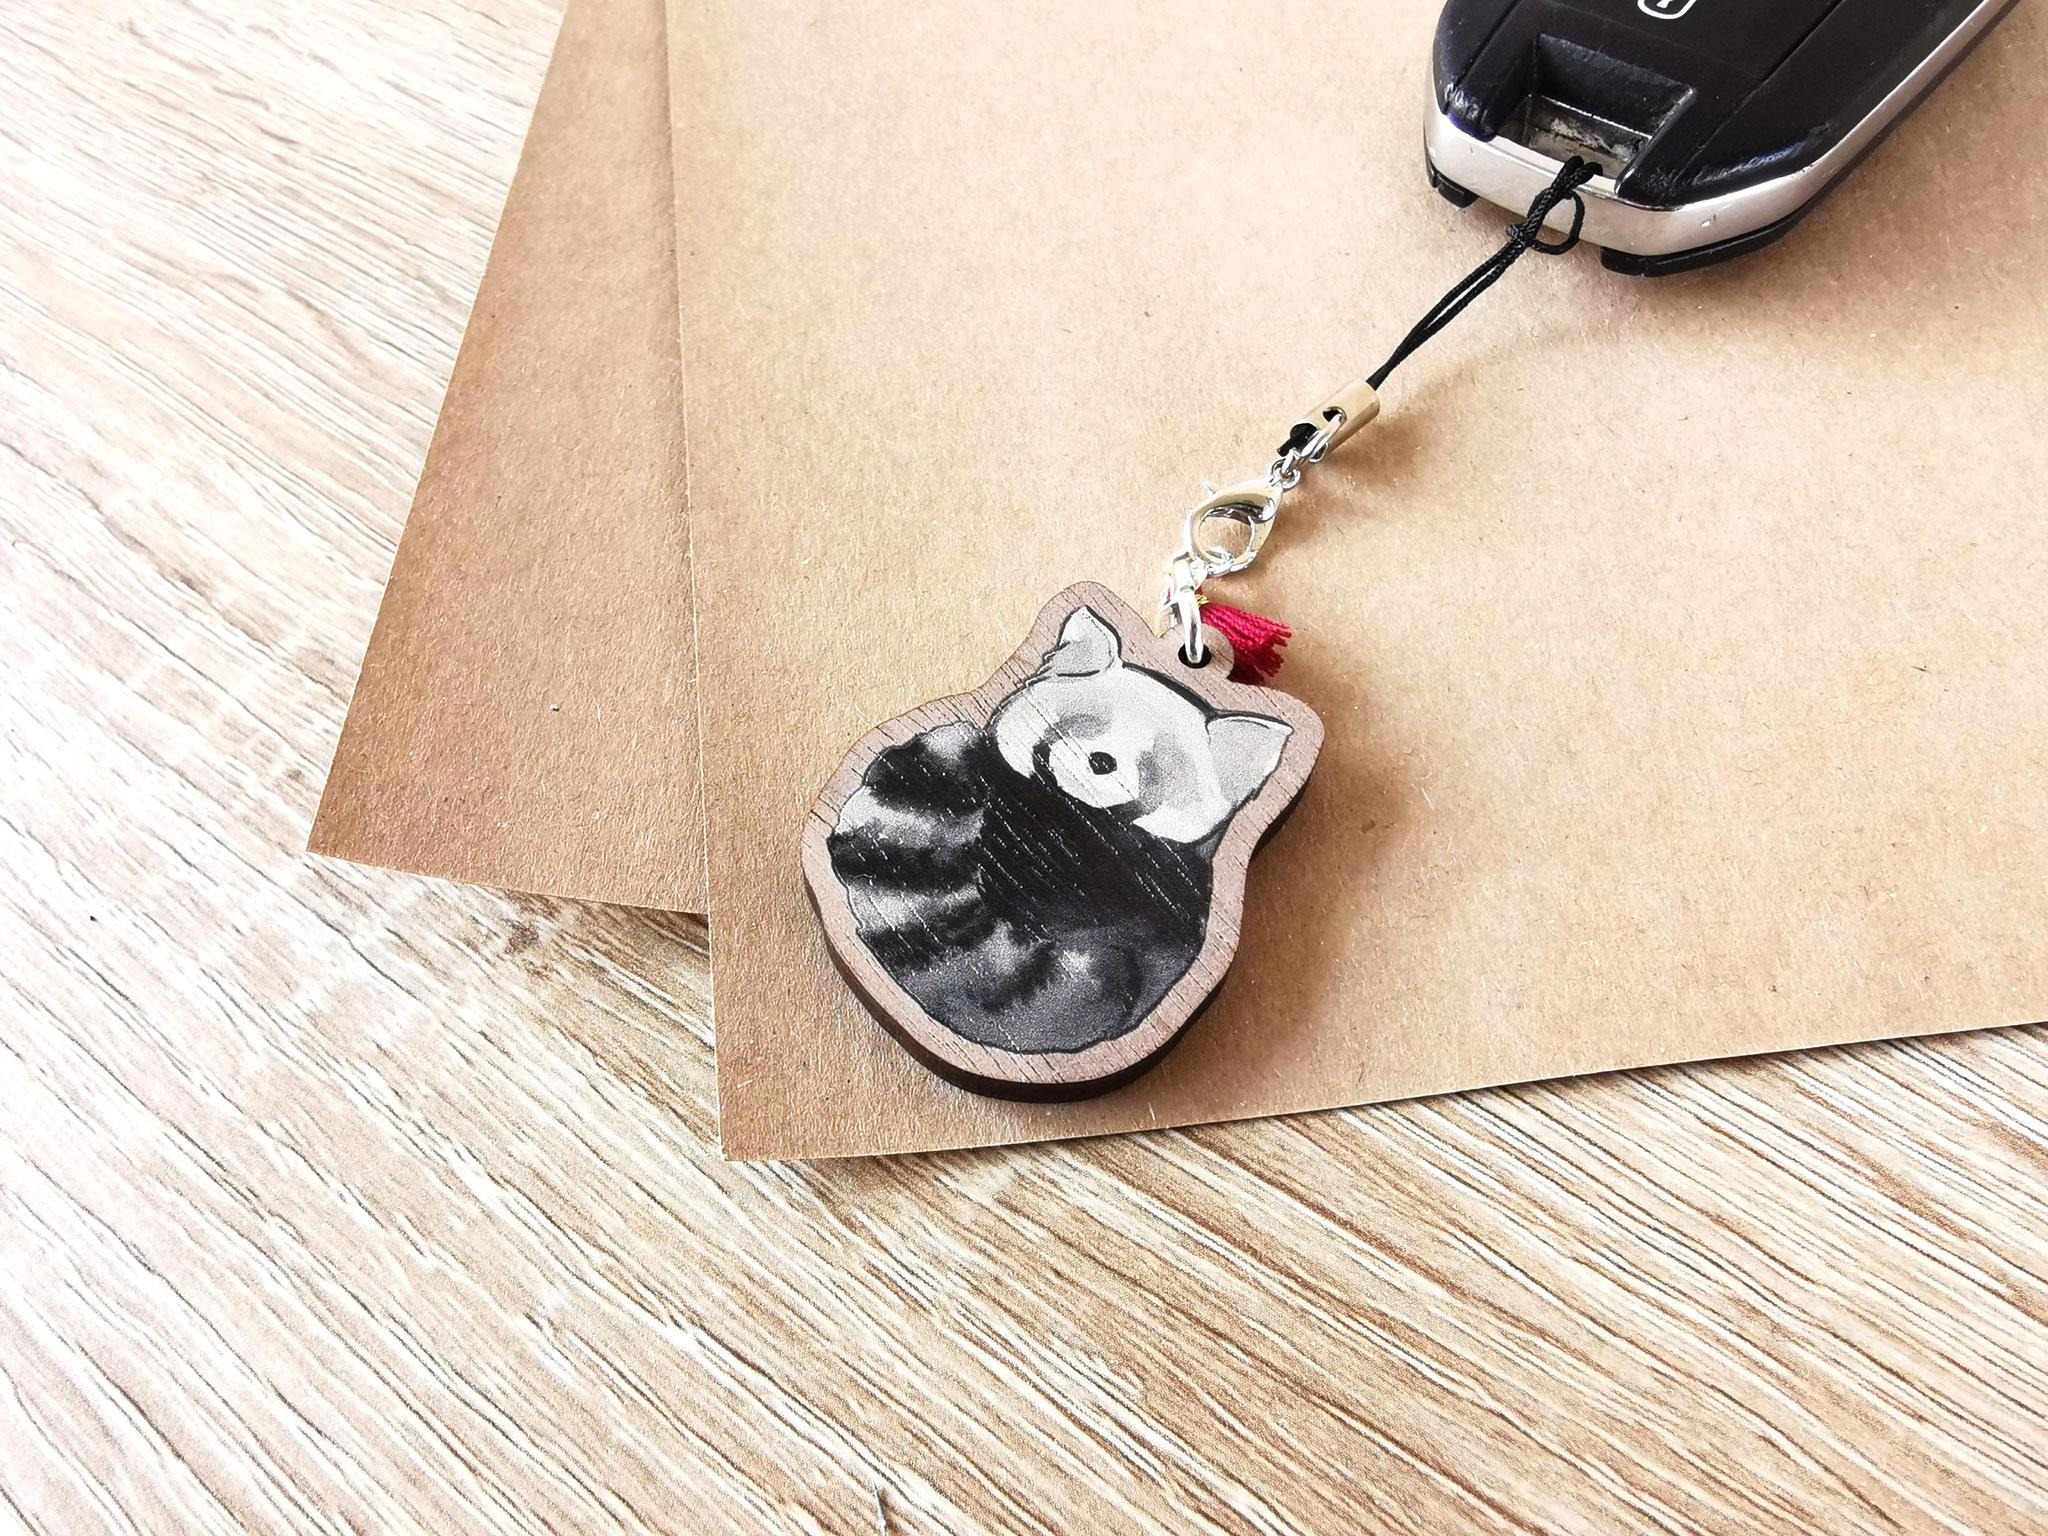 Panda-roux enroulé